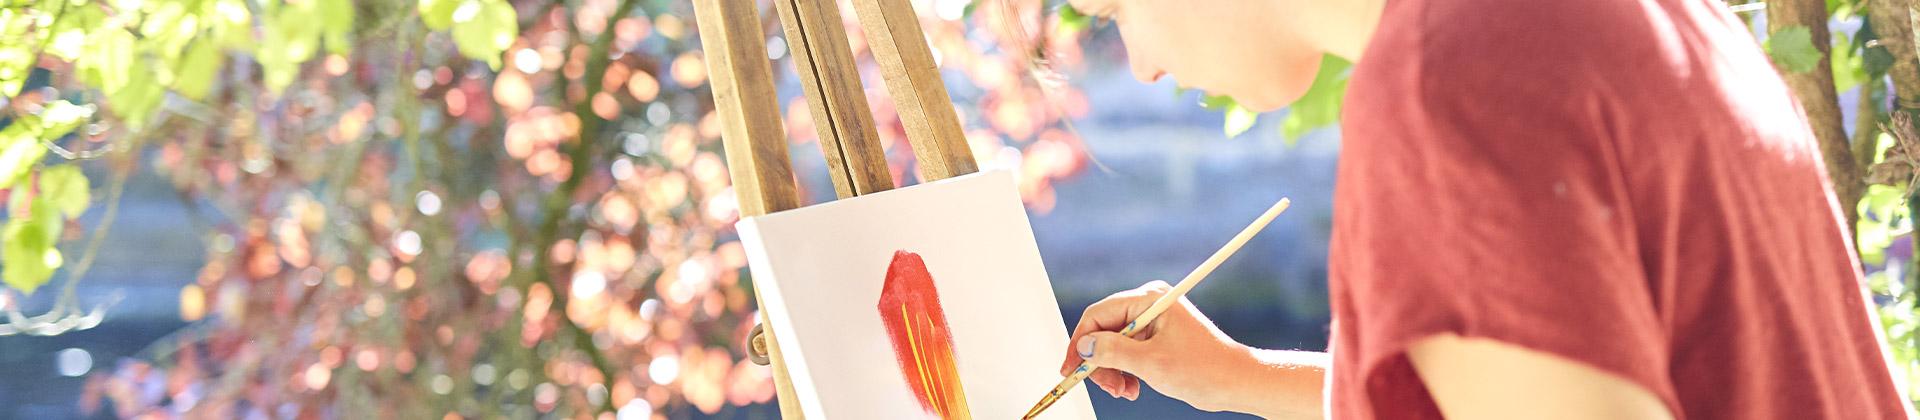 Cours, stages et initiations artistiques